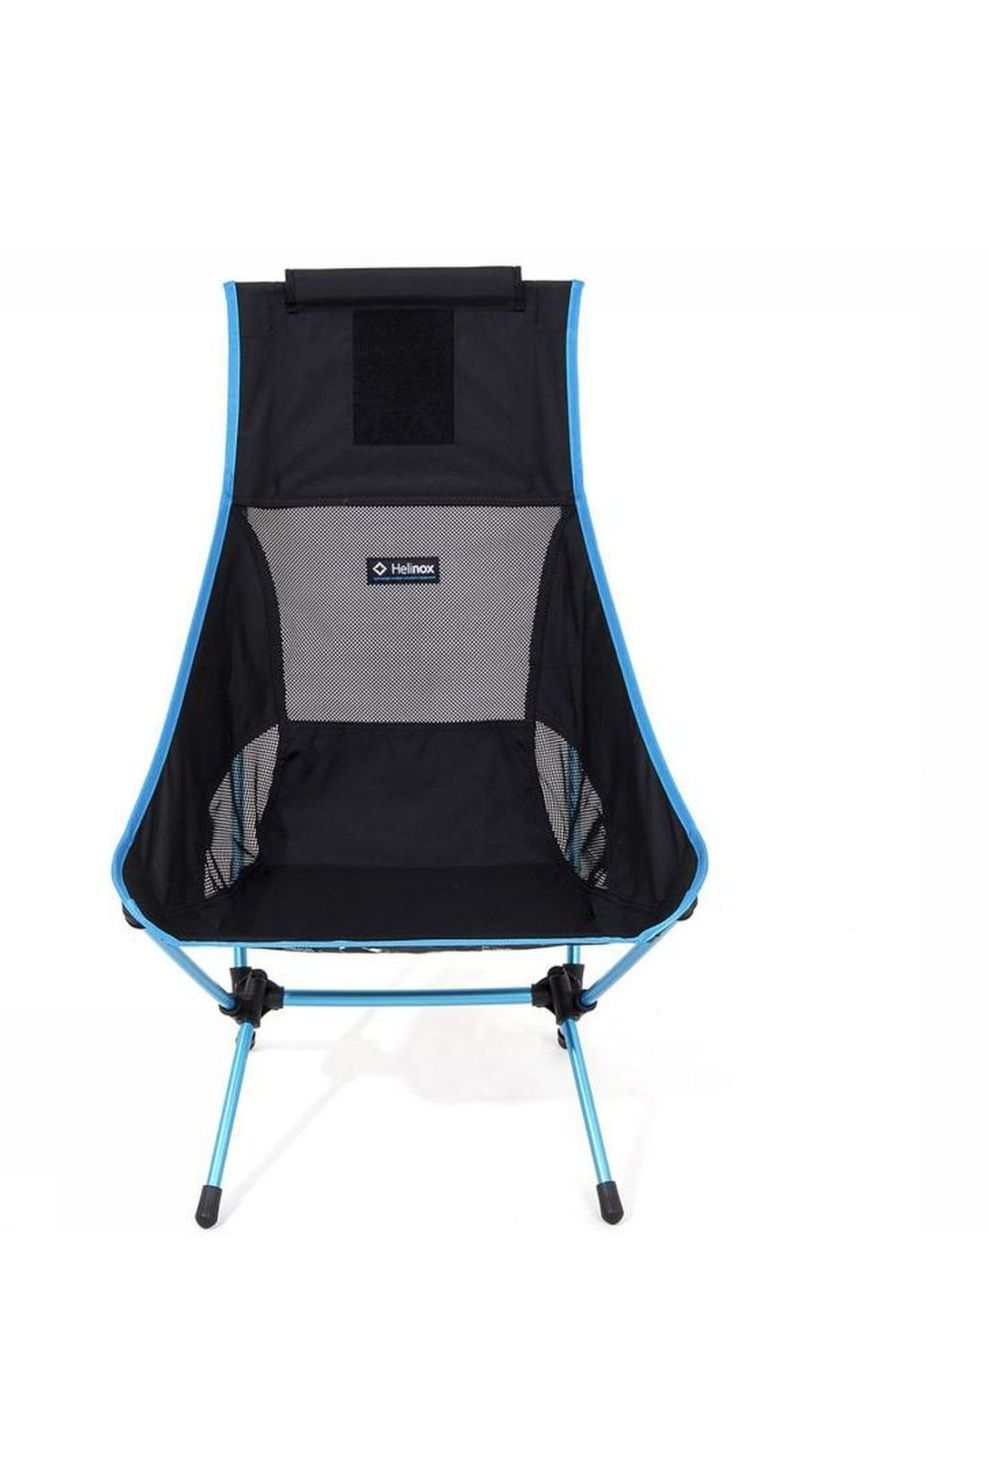 Helinox Reisstoel Compact Chair Two - Zwart/Blauw